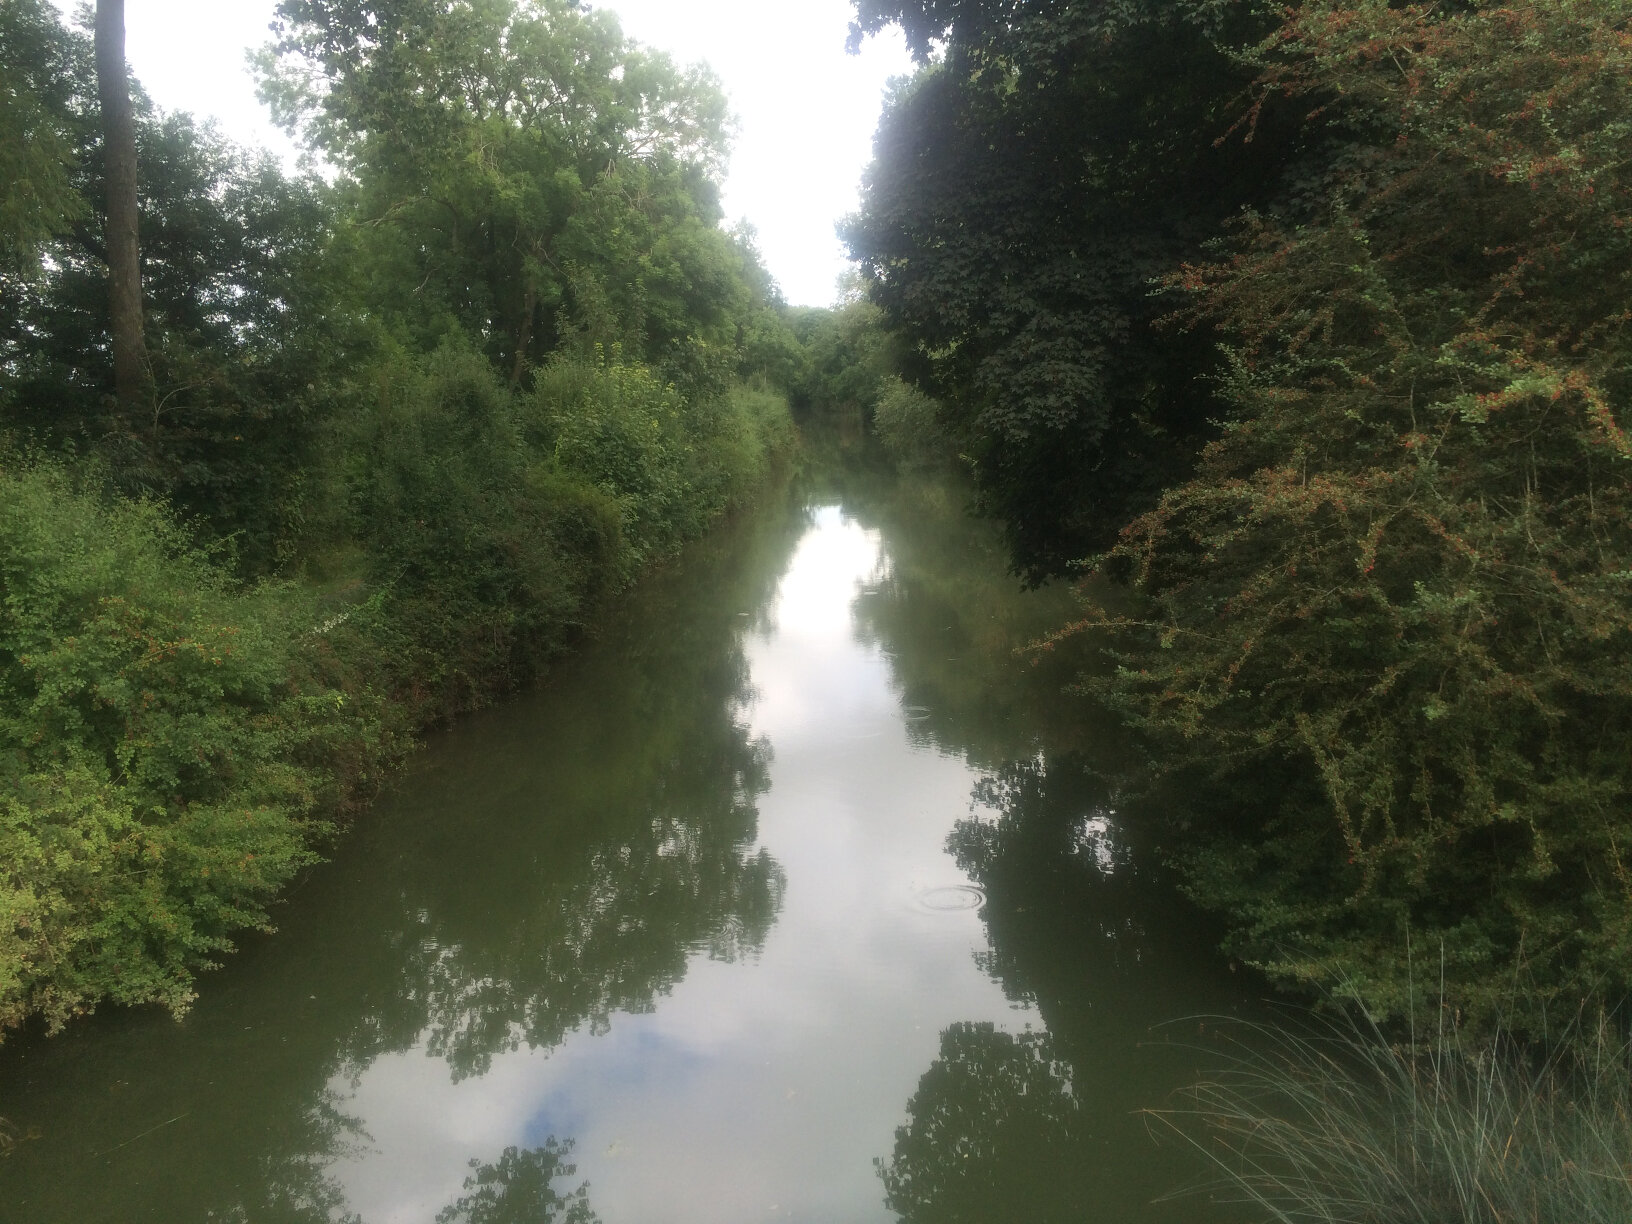 From Lechlade to Newbridge (57)